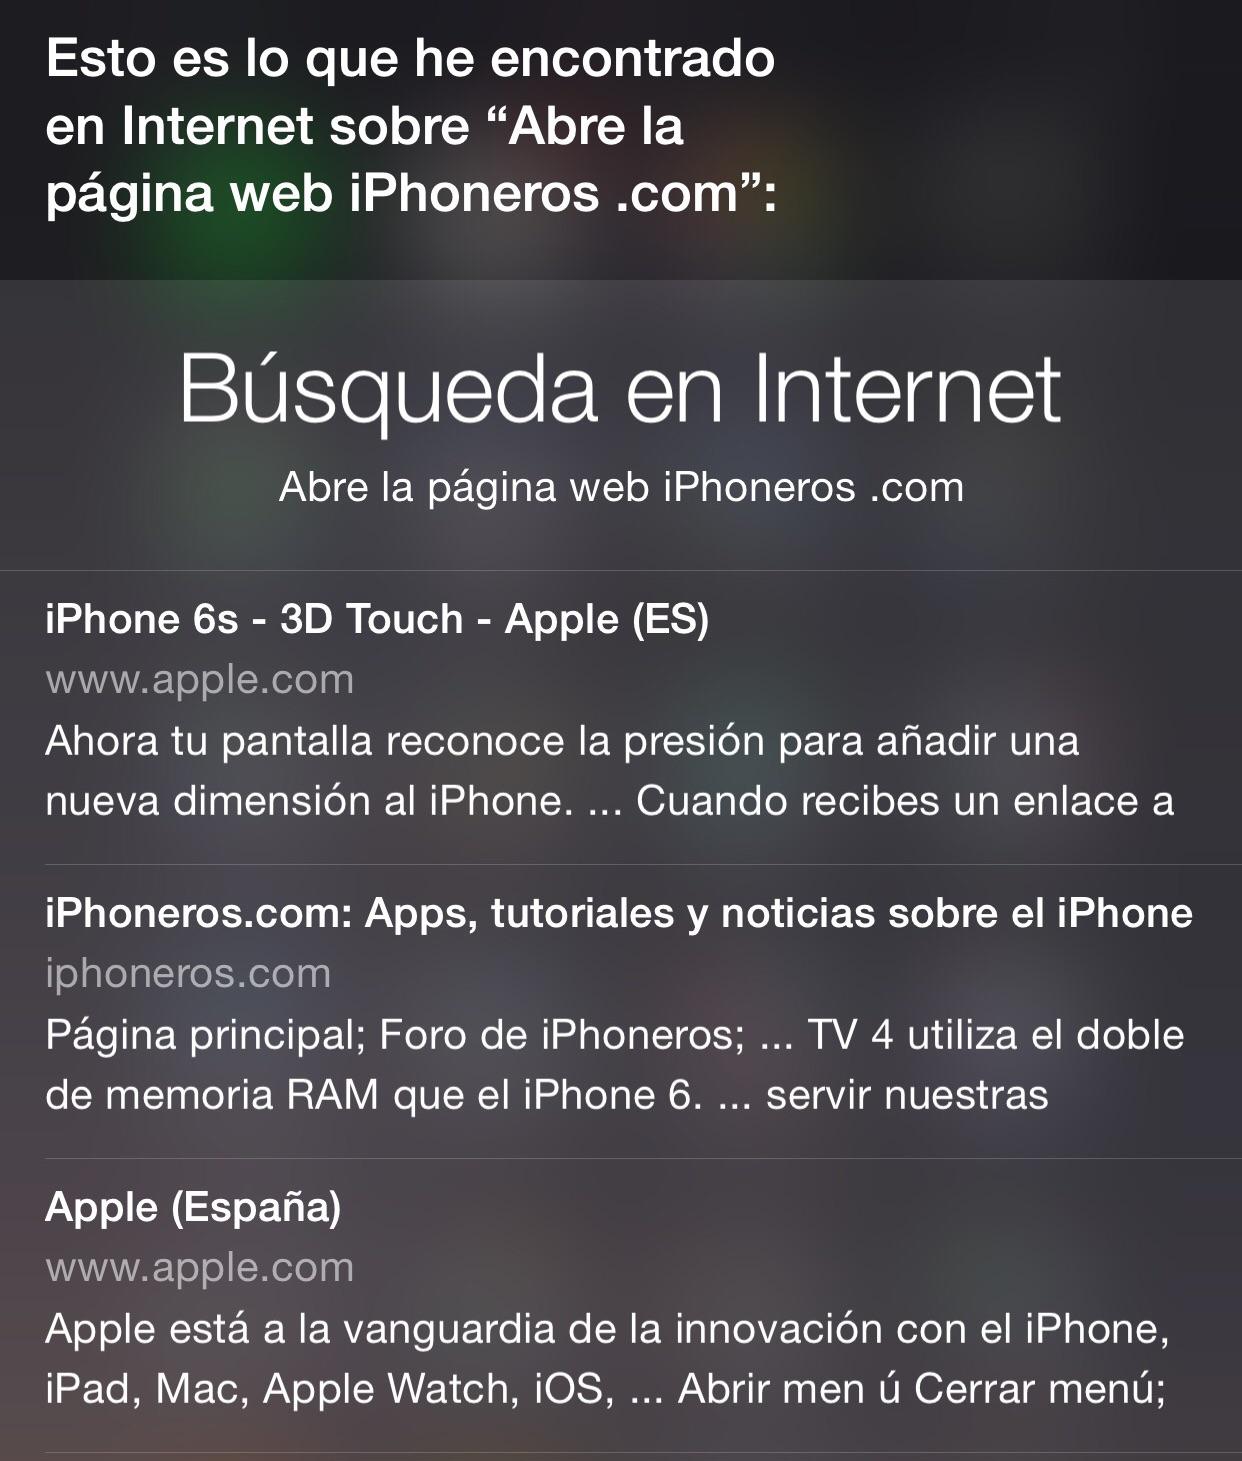 Siri no quiere abrir iPhoneros.com